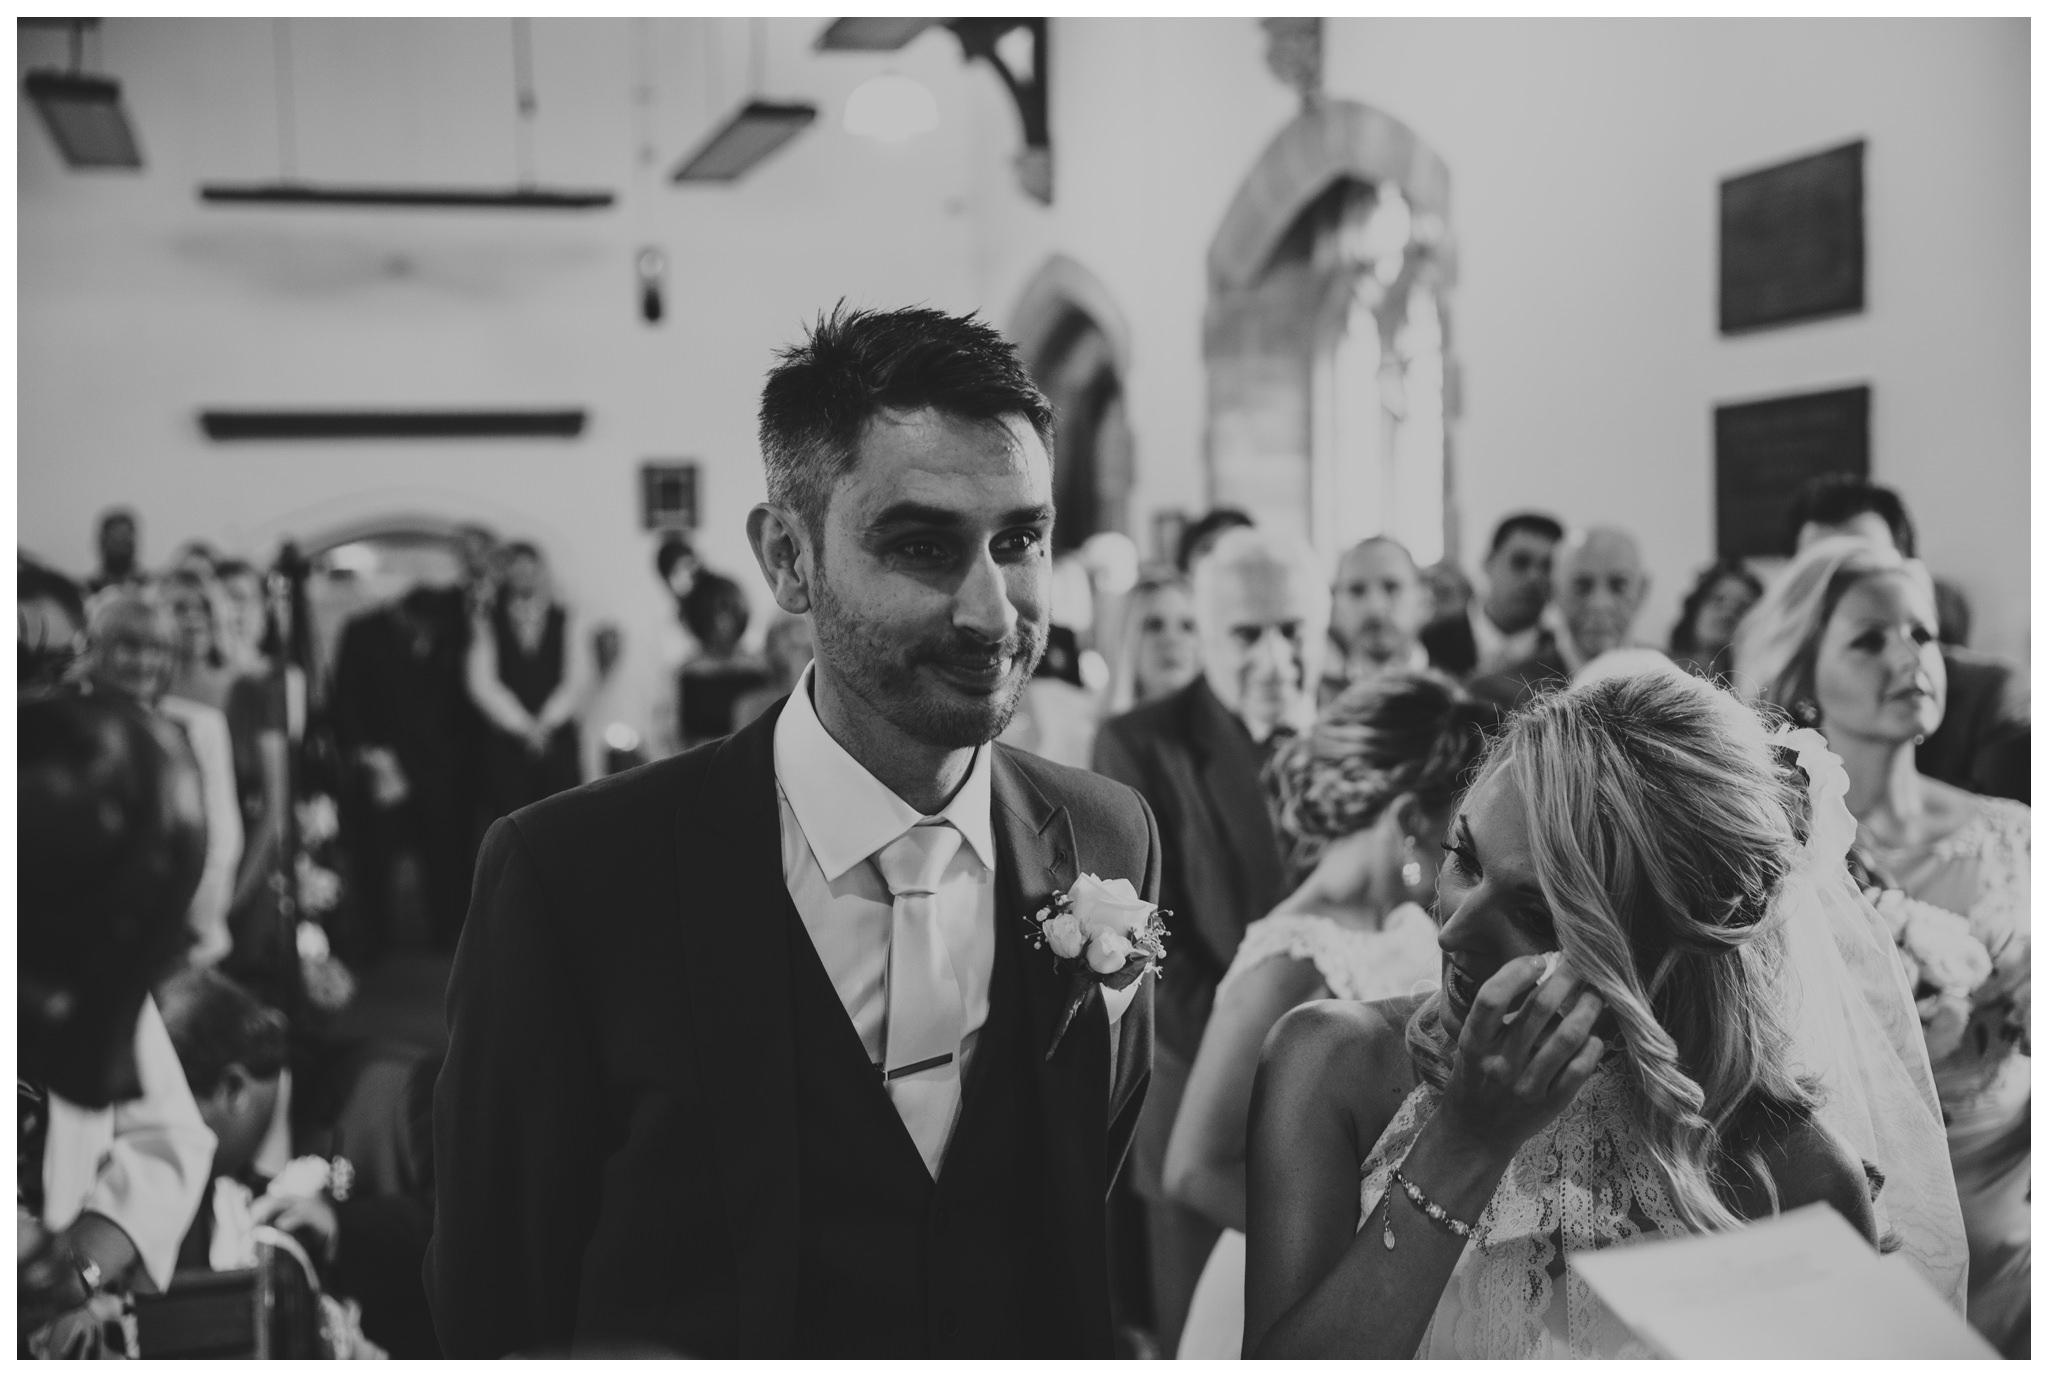 Richard Savage Photography - Wedding - Peterstone Court Brecon - 2016-05-11_0024